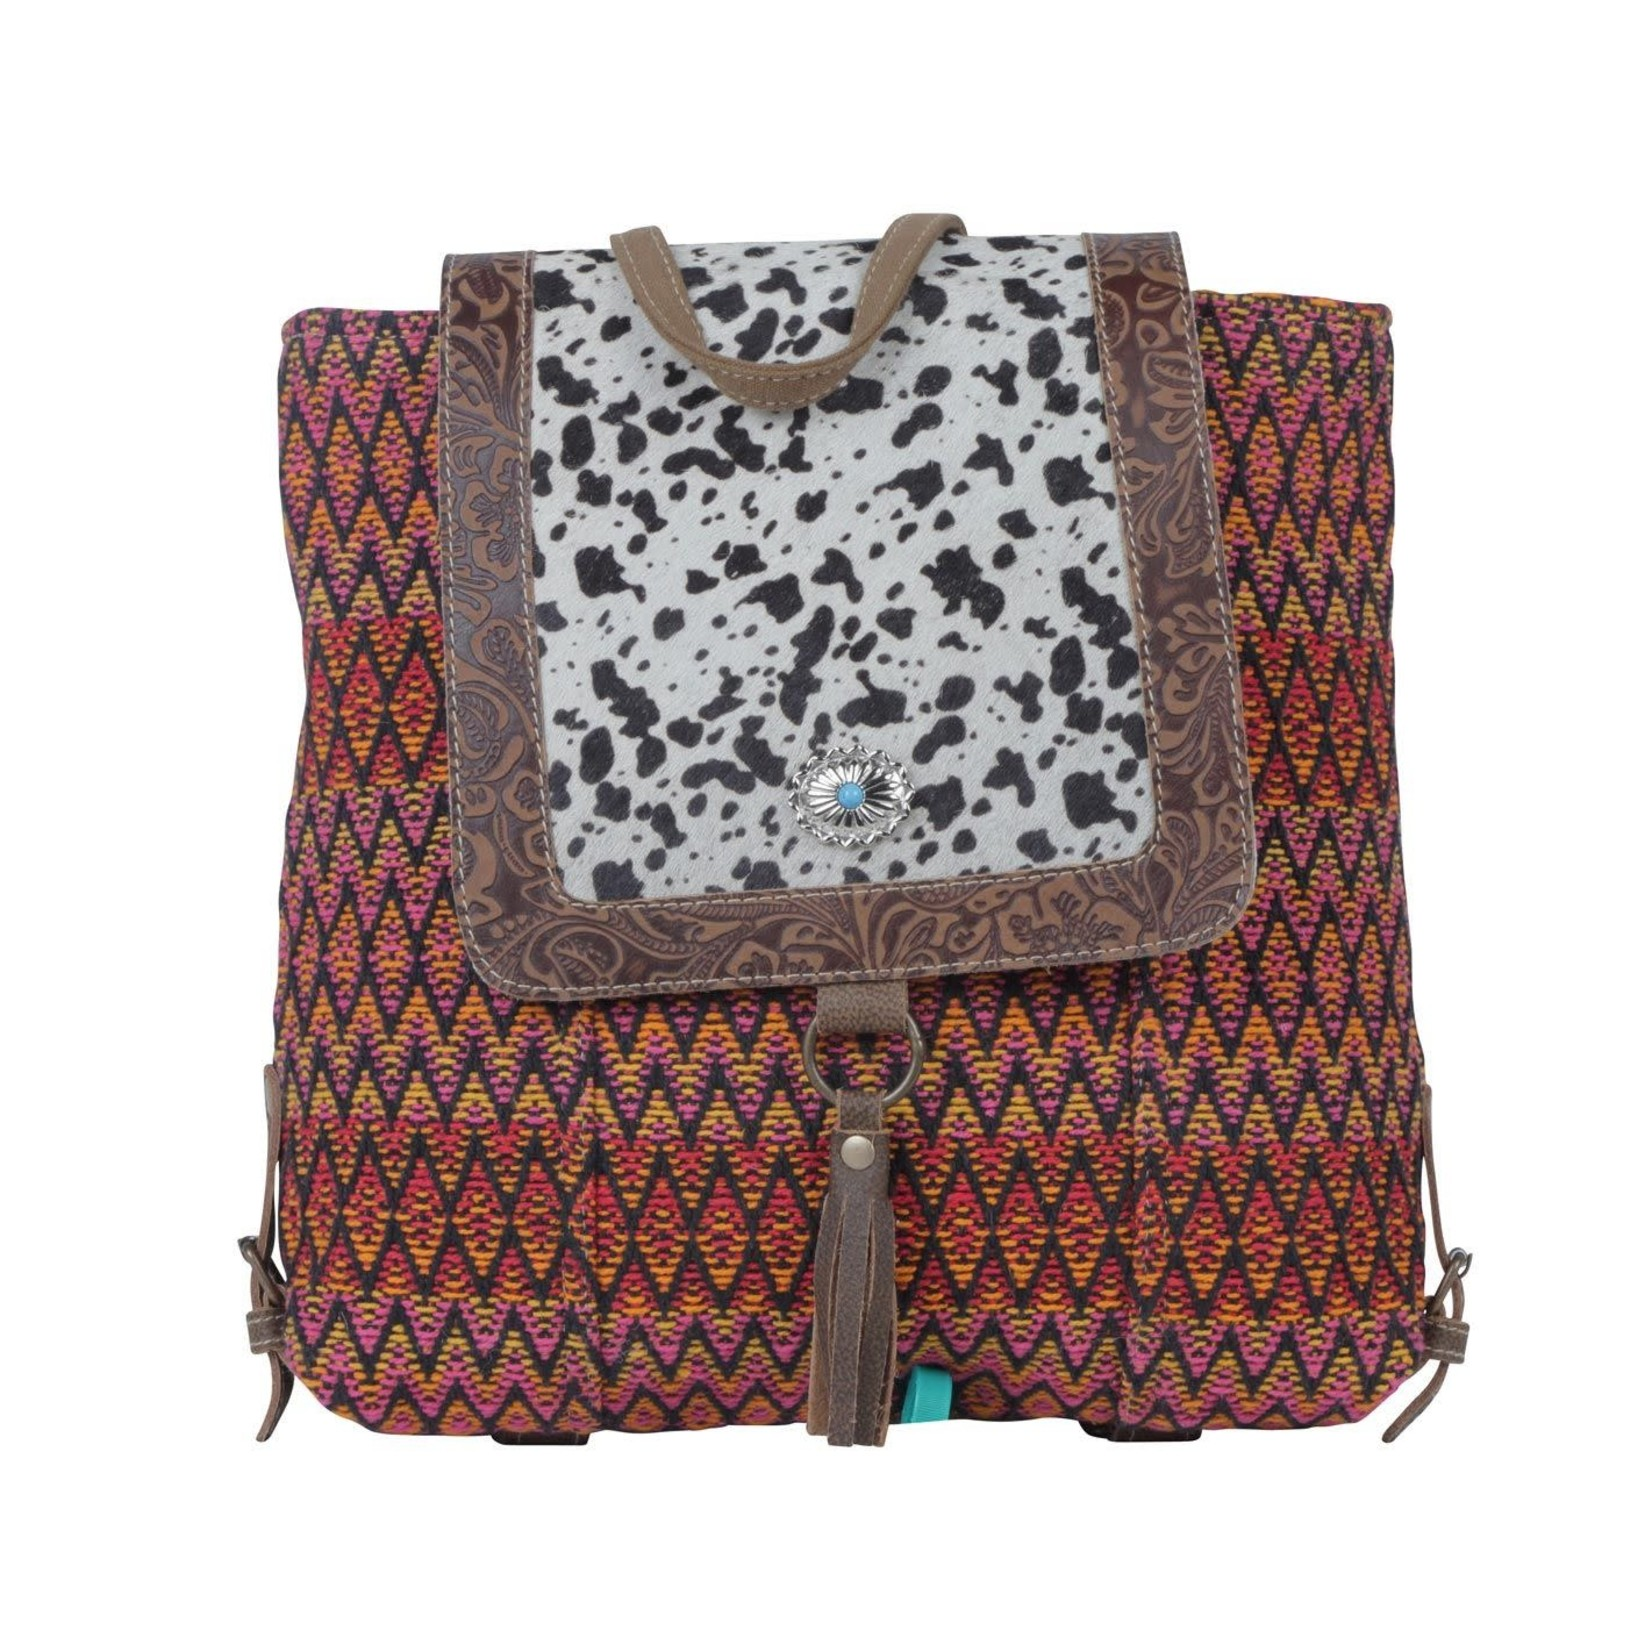 Myra Bags Flamboyance Backpack